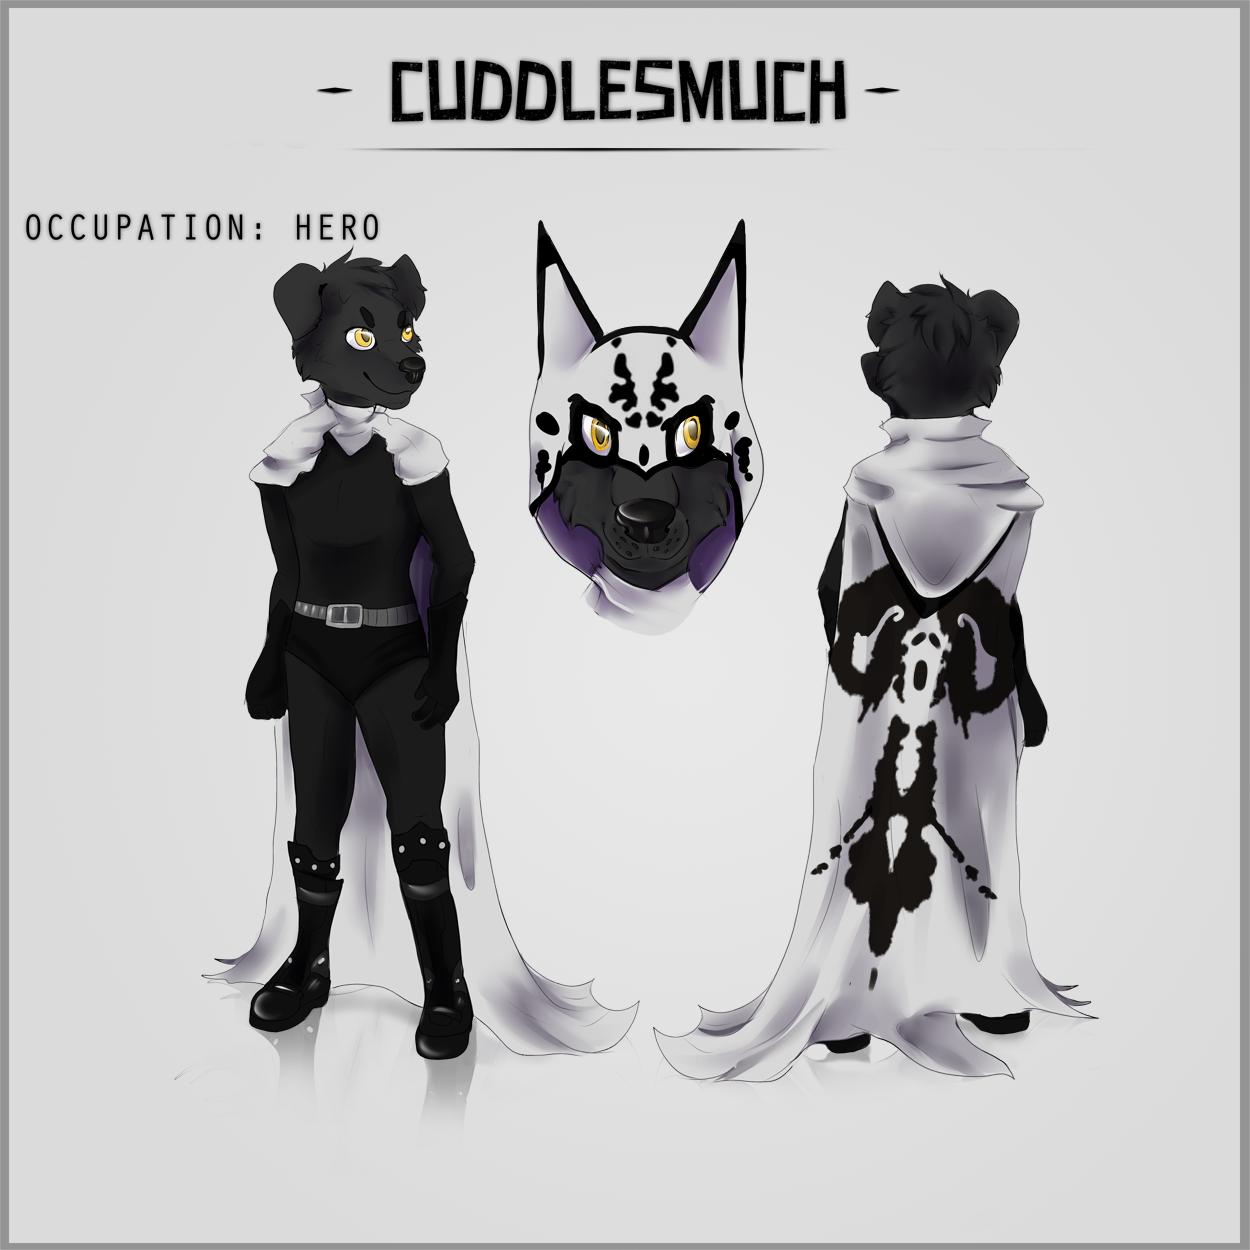 CUDDLESMUCH's Fursona Avatar